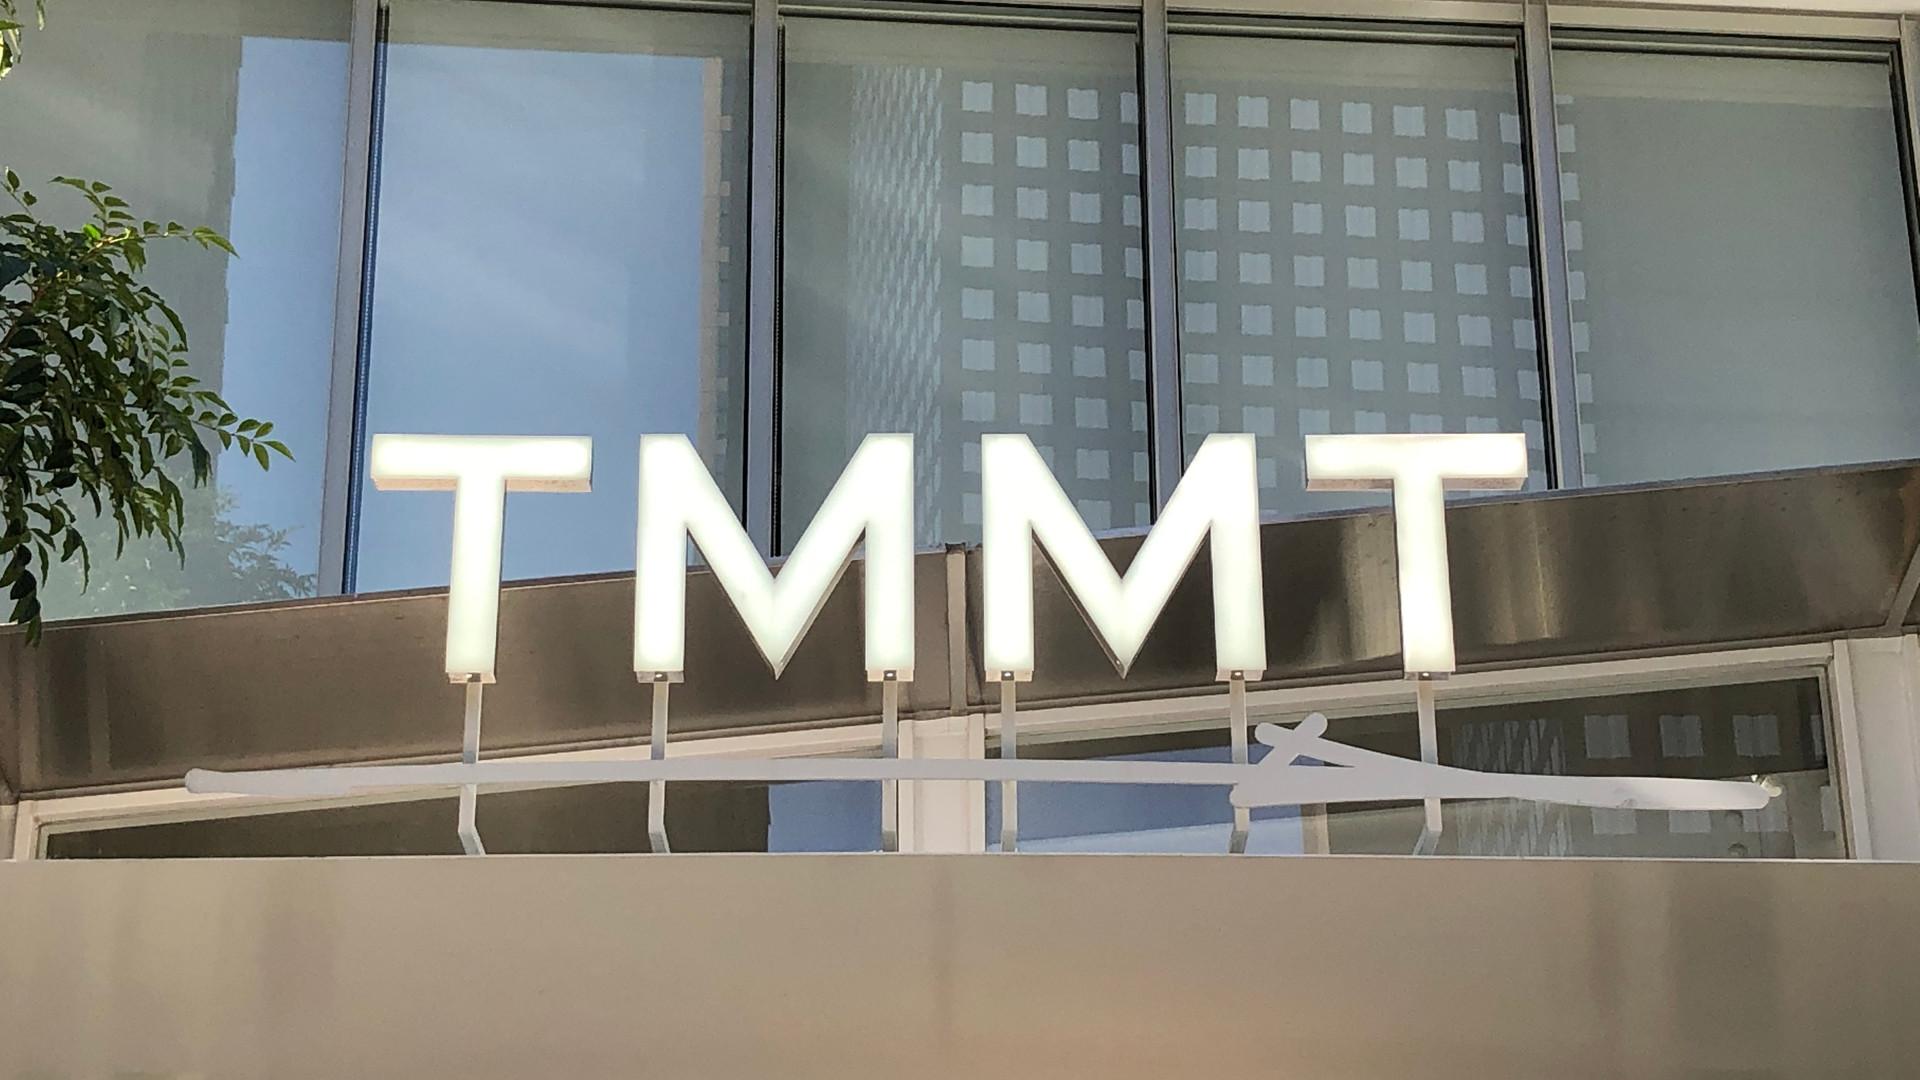 TMMTサイン工事